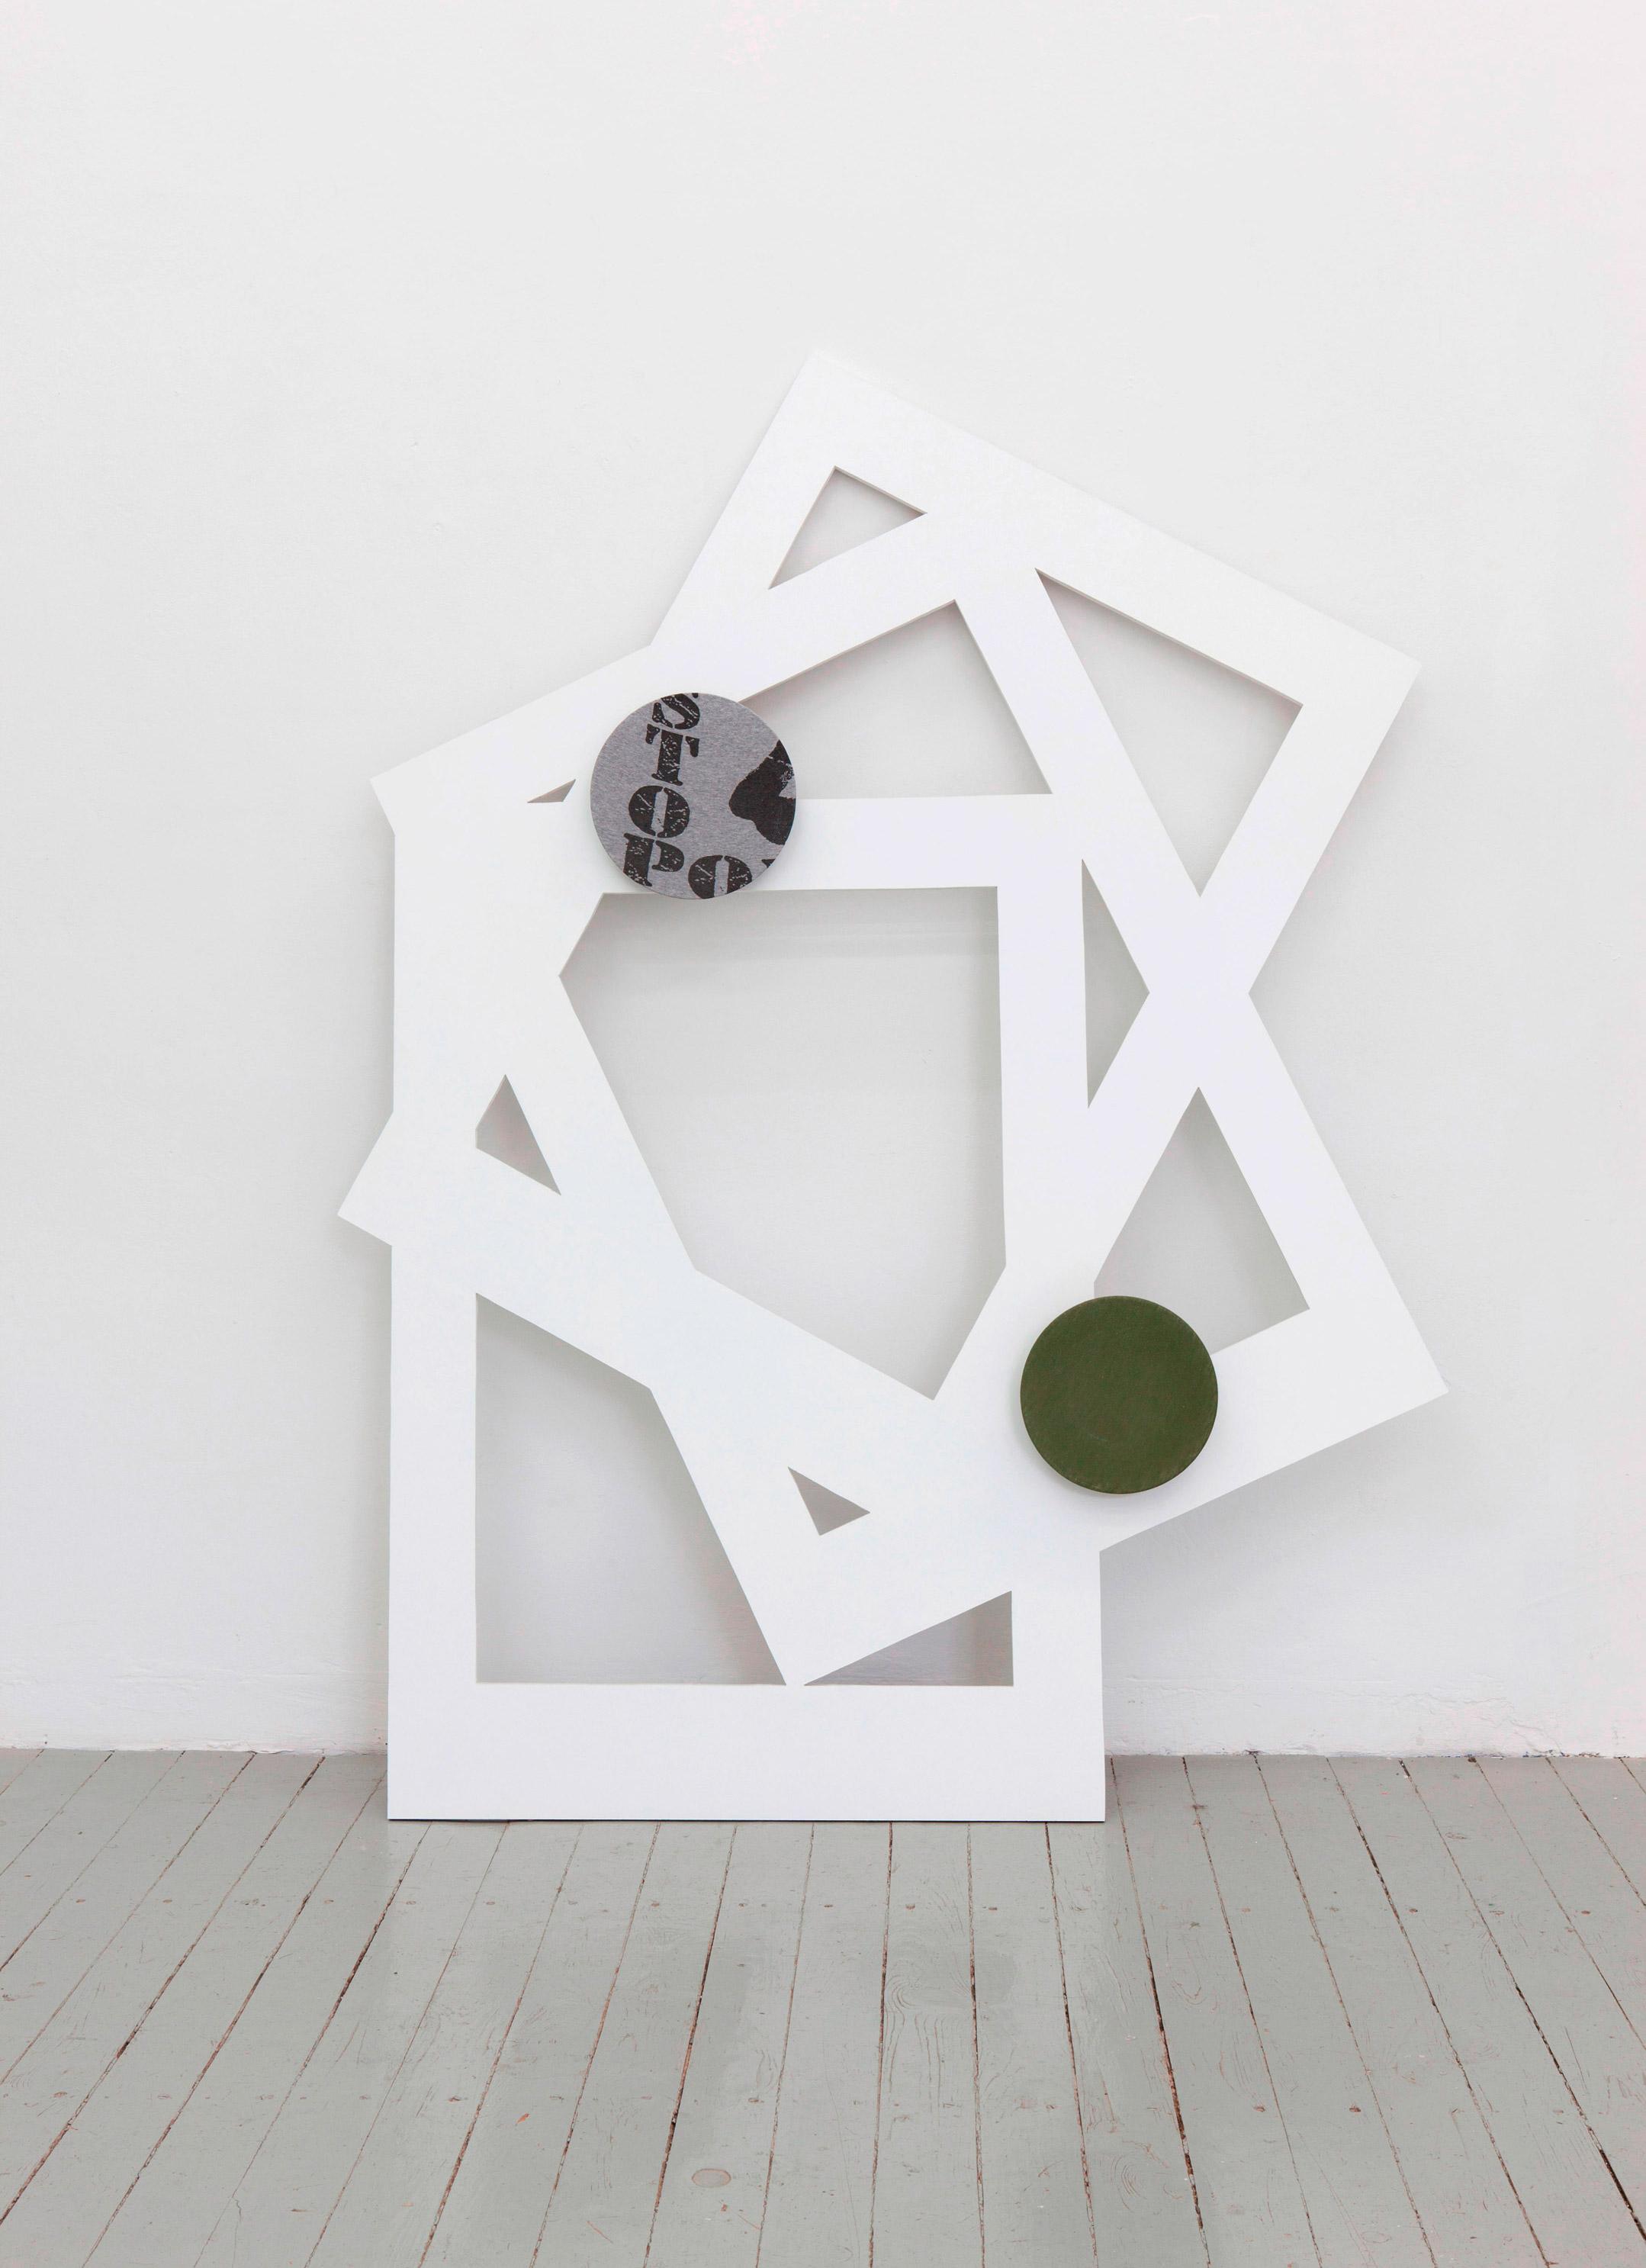 Nonpaper 2011 - MICHAEL HAKIMI